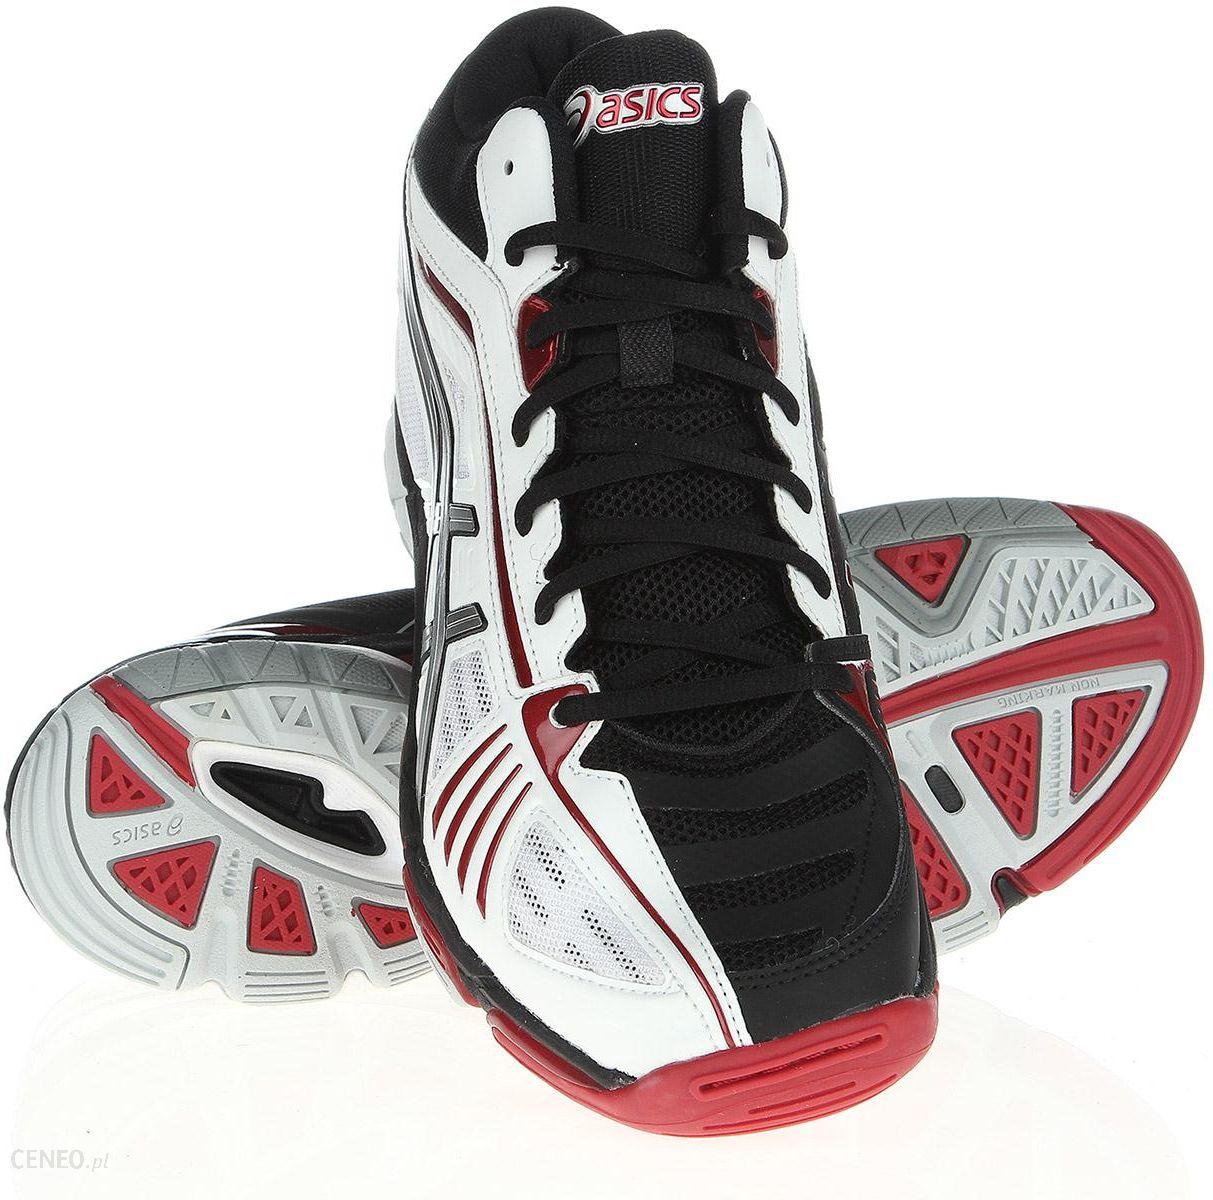 Asics Gel Volley Elite 2 MT B300N 0193 Ceny i opinie Ceneo.pl